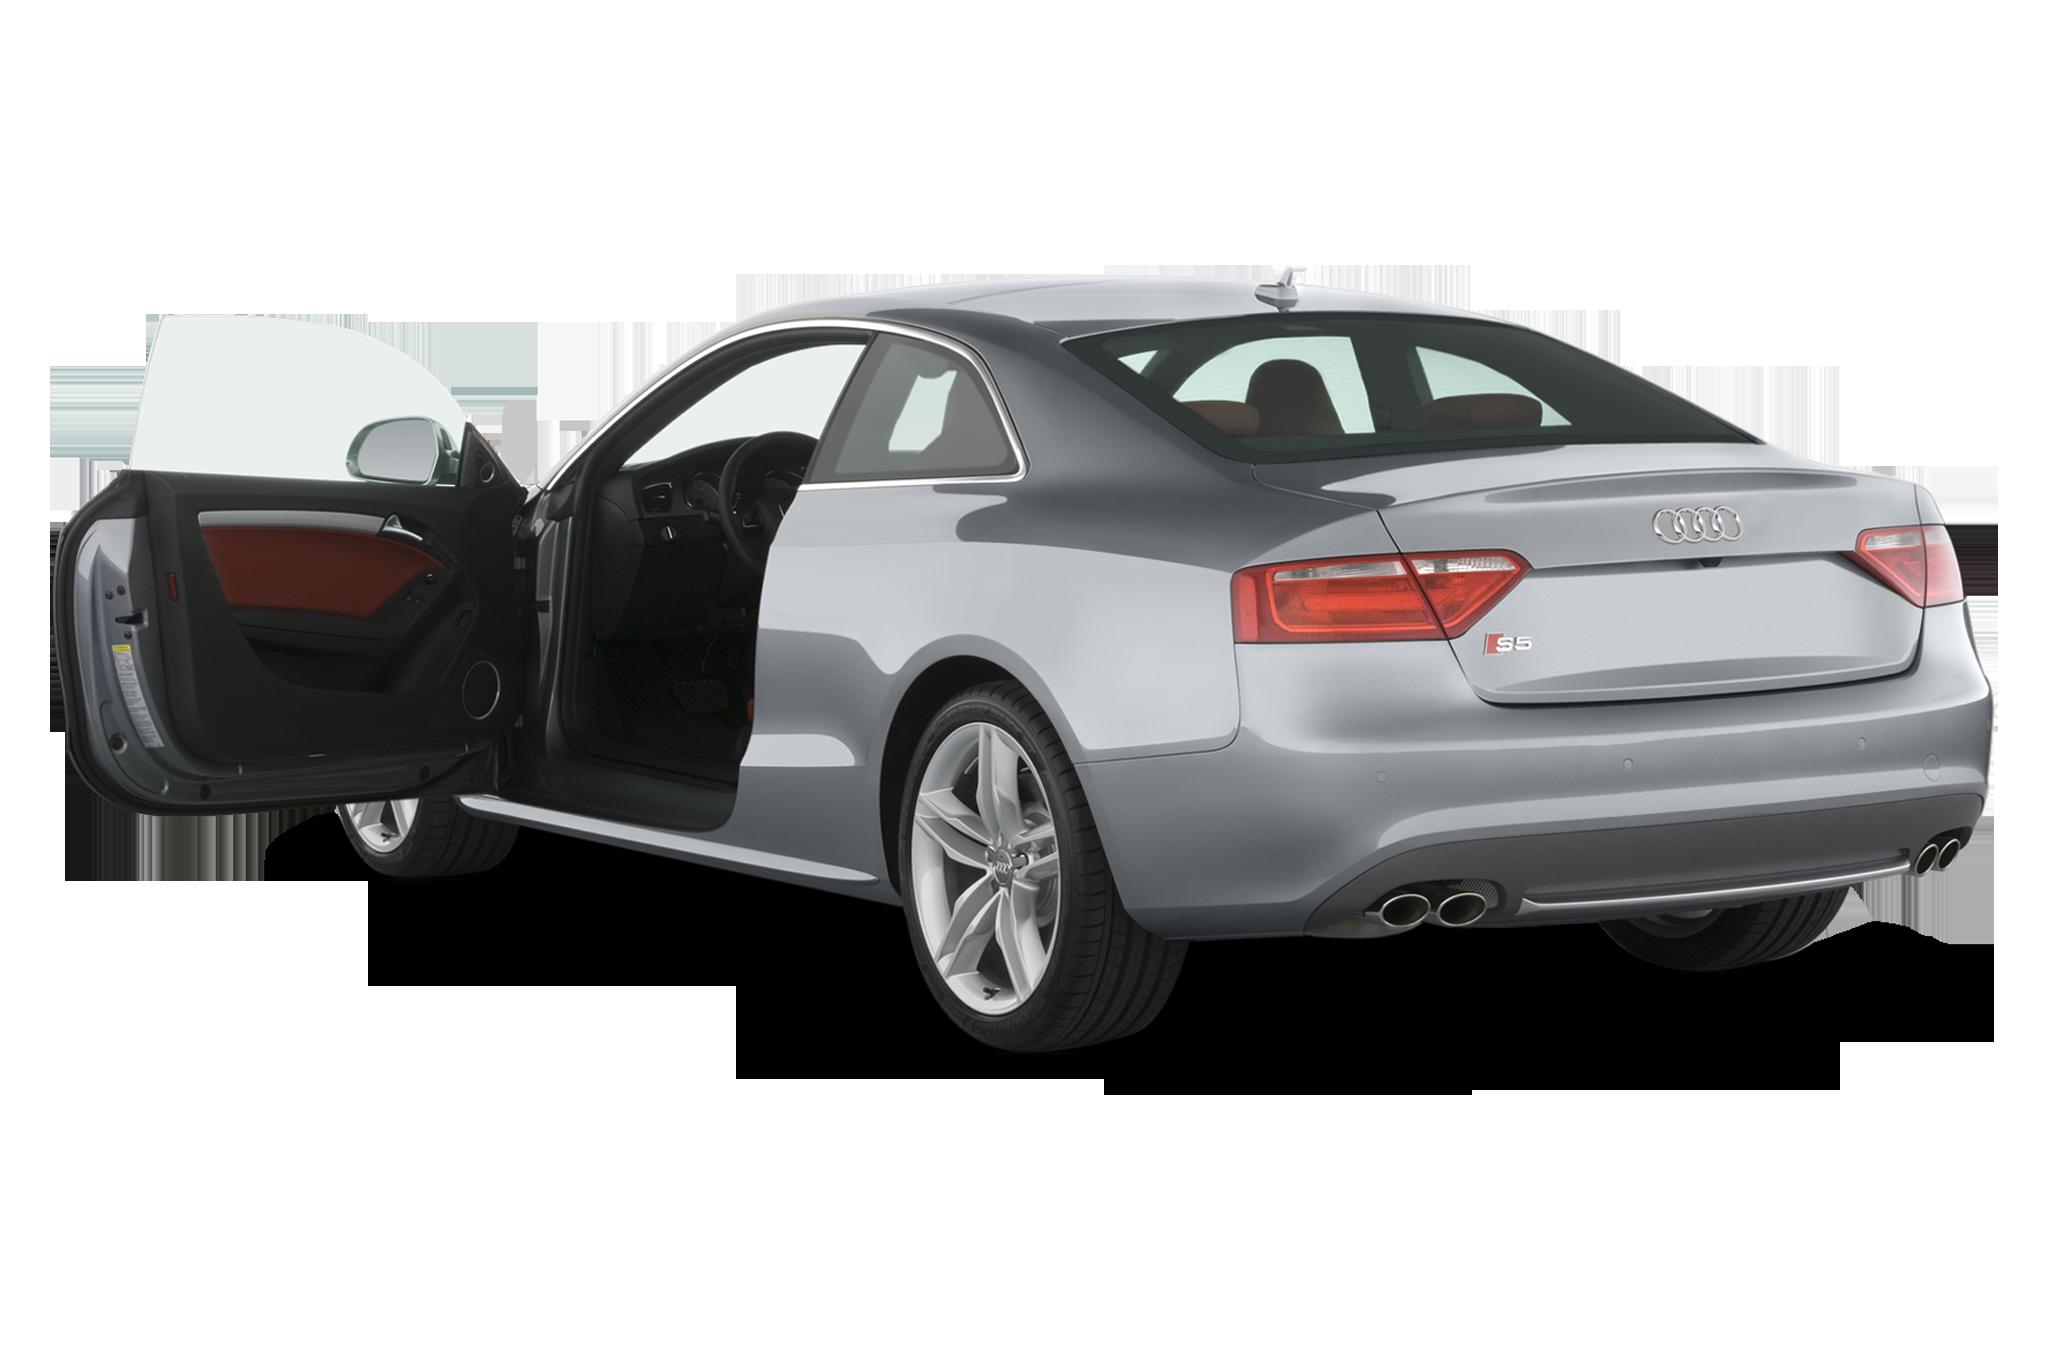 2010 Audi S5 Coupe Audi Luxury Sport Coupe Review Automobile